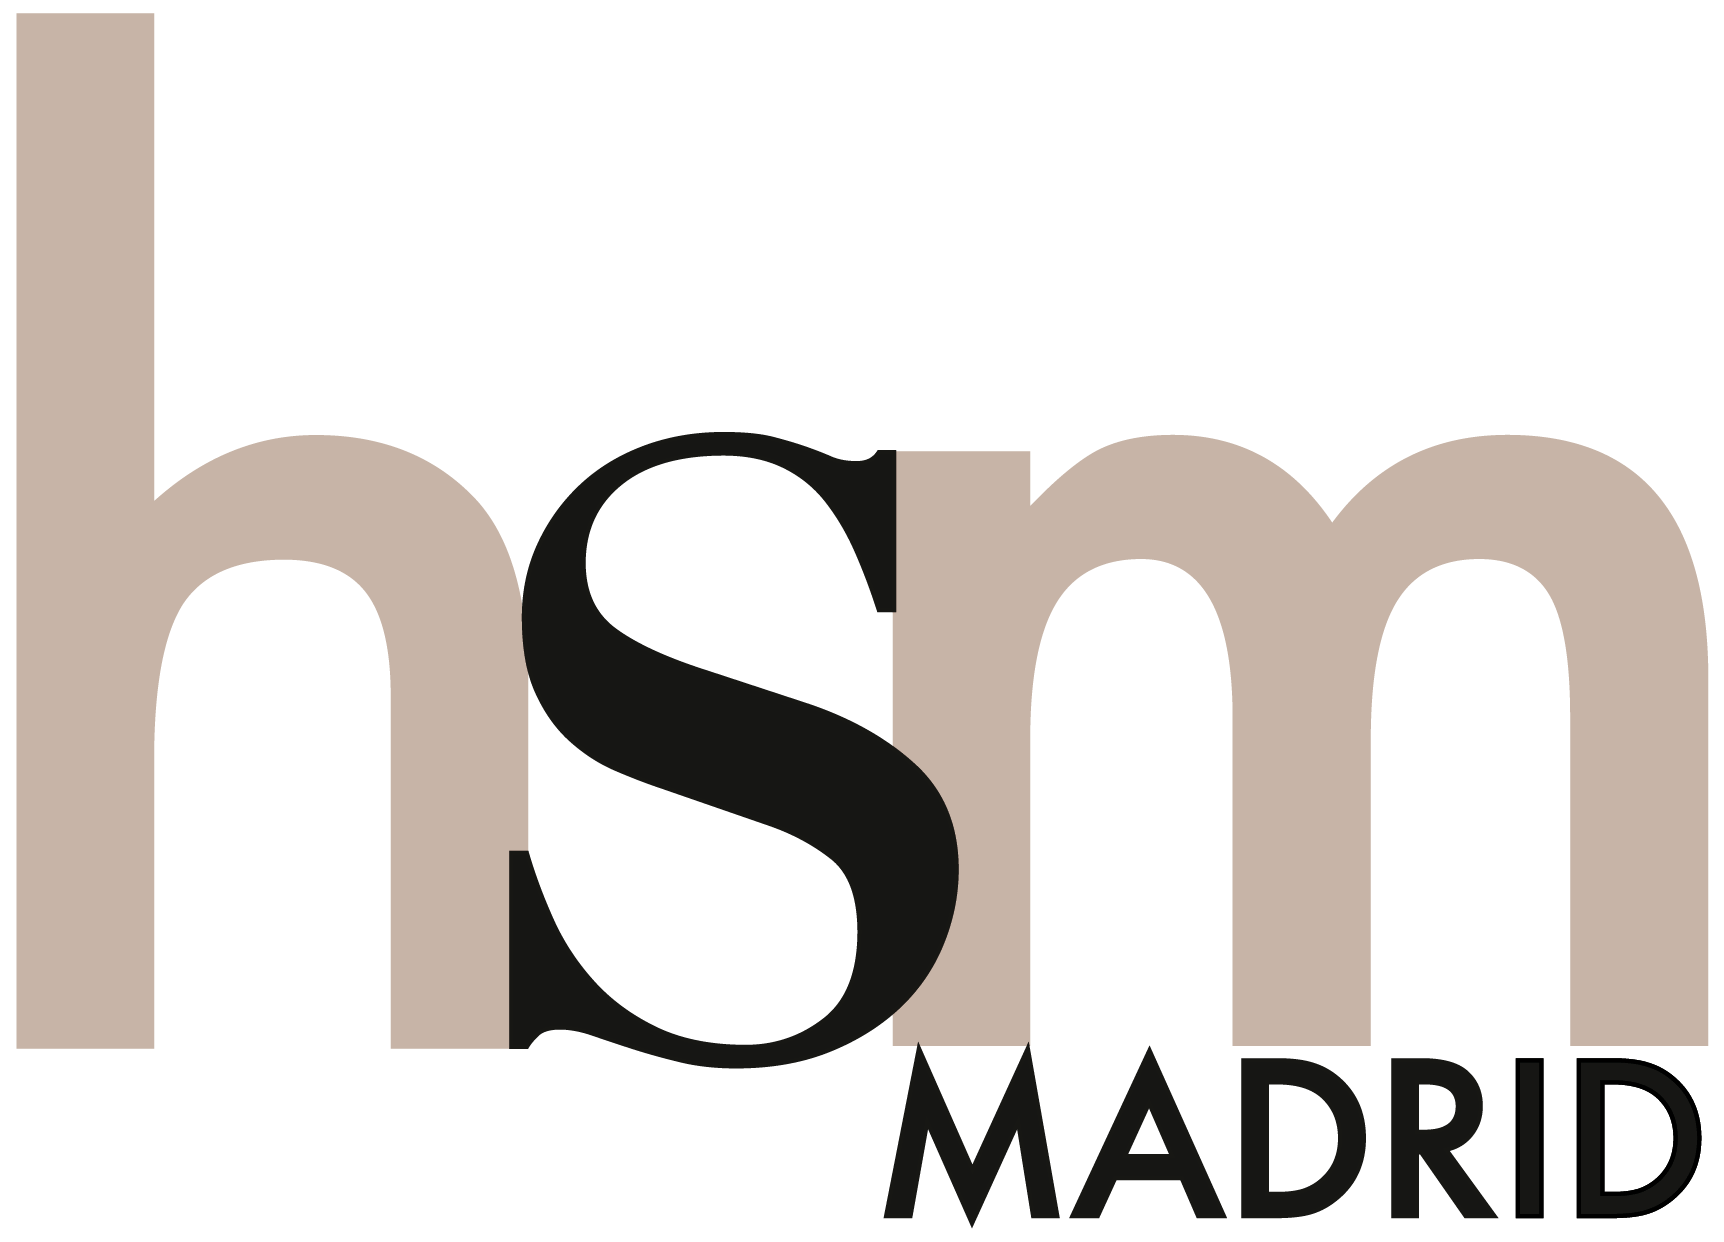 Hsm Madrid